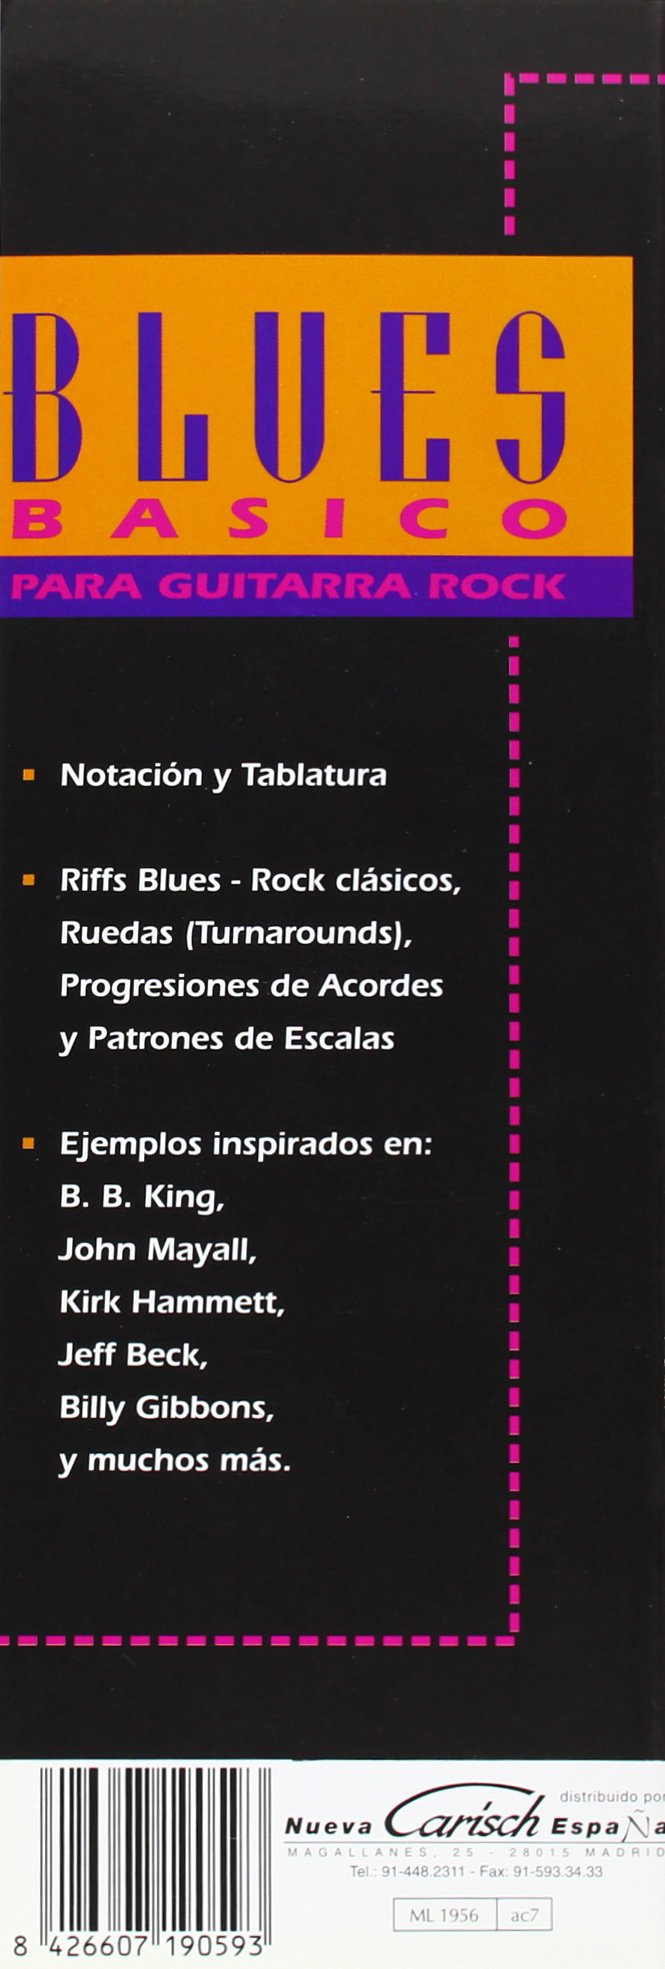 Blues Básico para Guitarra Rock (Poket Guide): Amazon.es: John Stix, Yoichi Arakawa, Guitar: Libros